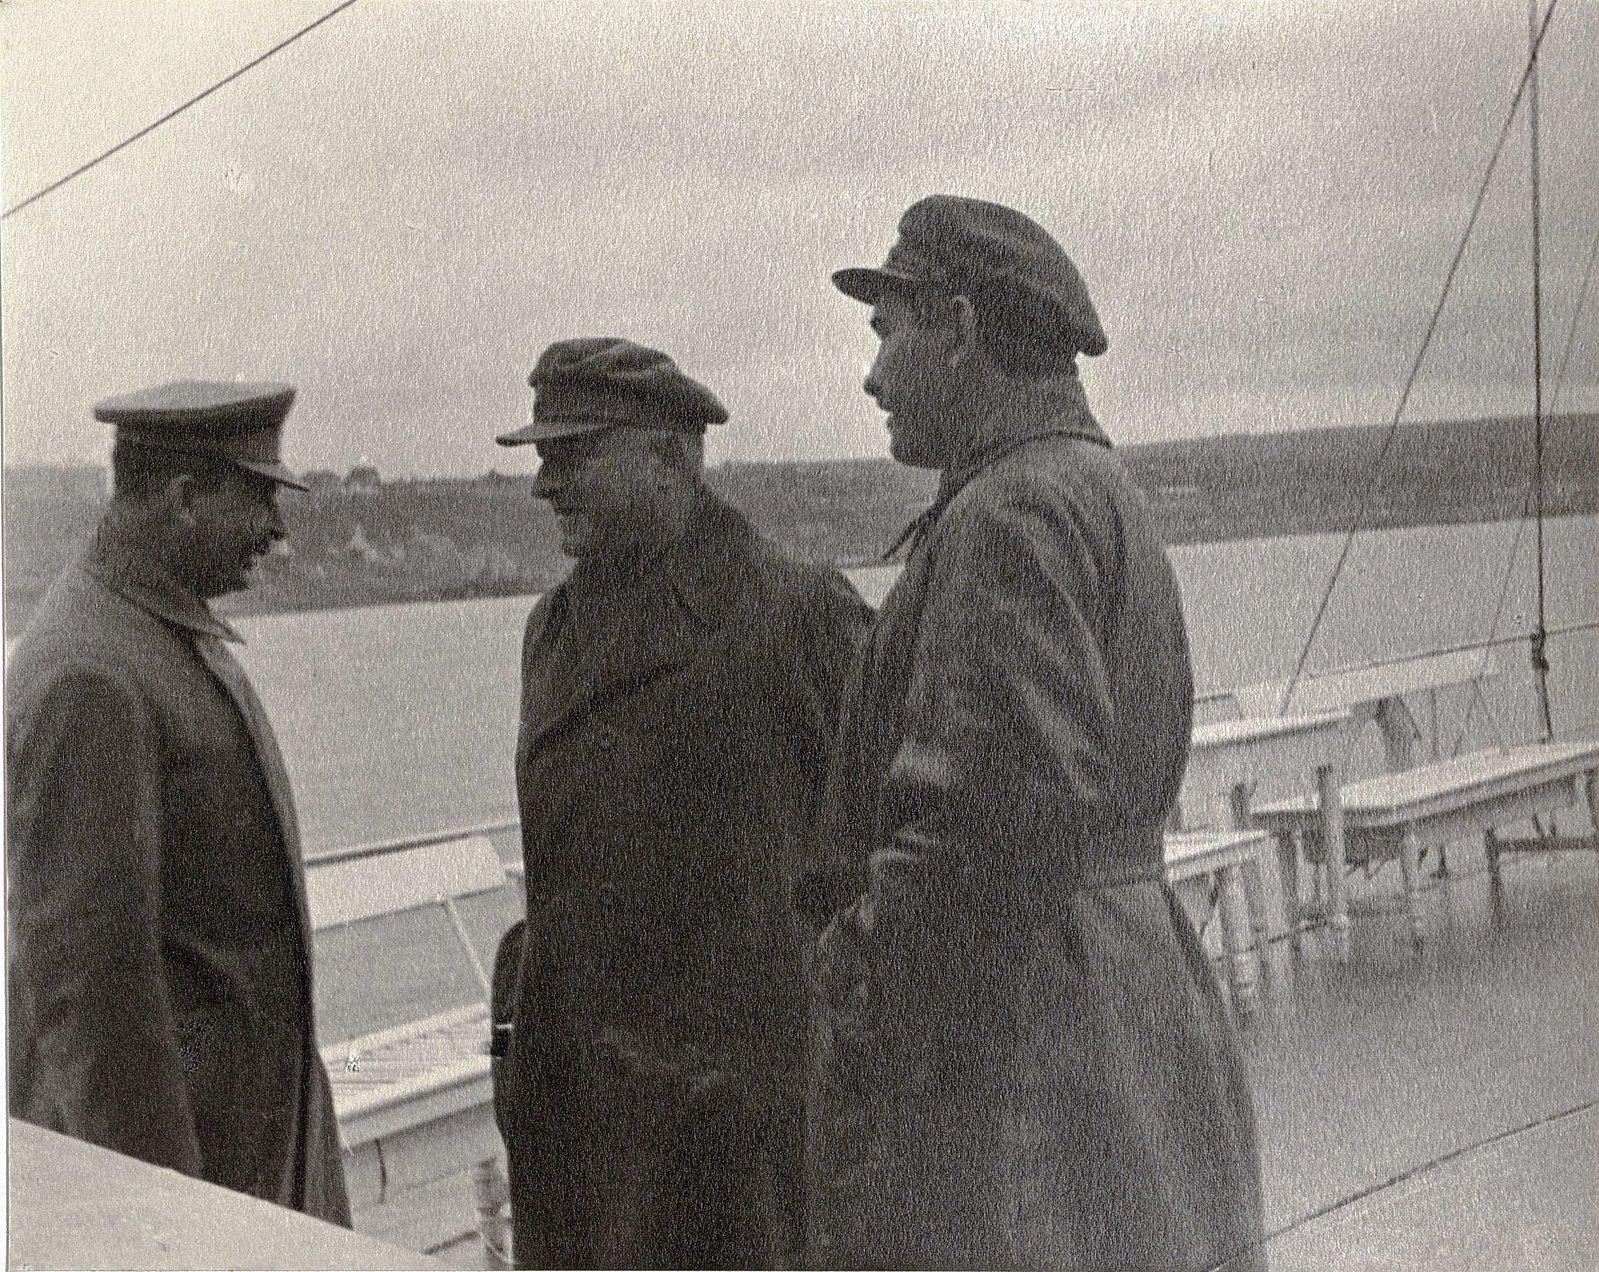 24. И.В. Сталин, К.В. Паукер, Н.С. Власик. Теплоход Клара Цеткин Август 1933